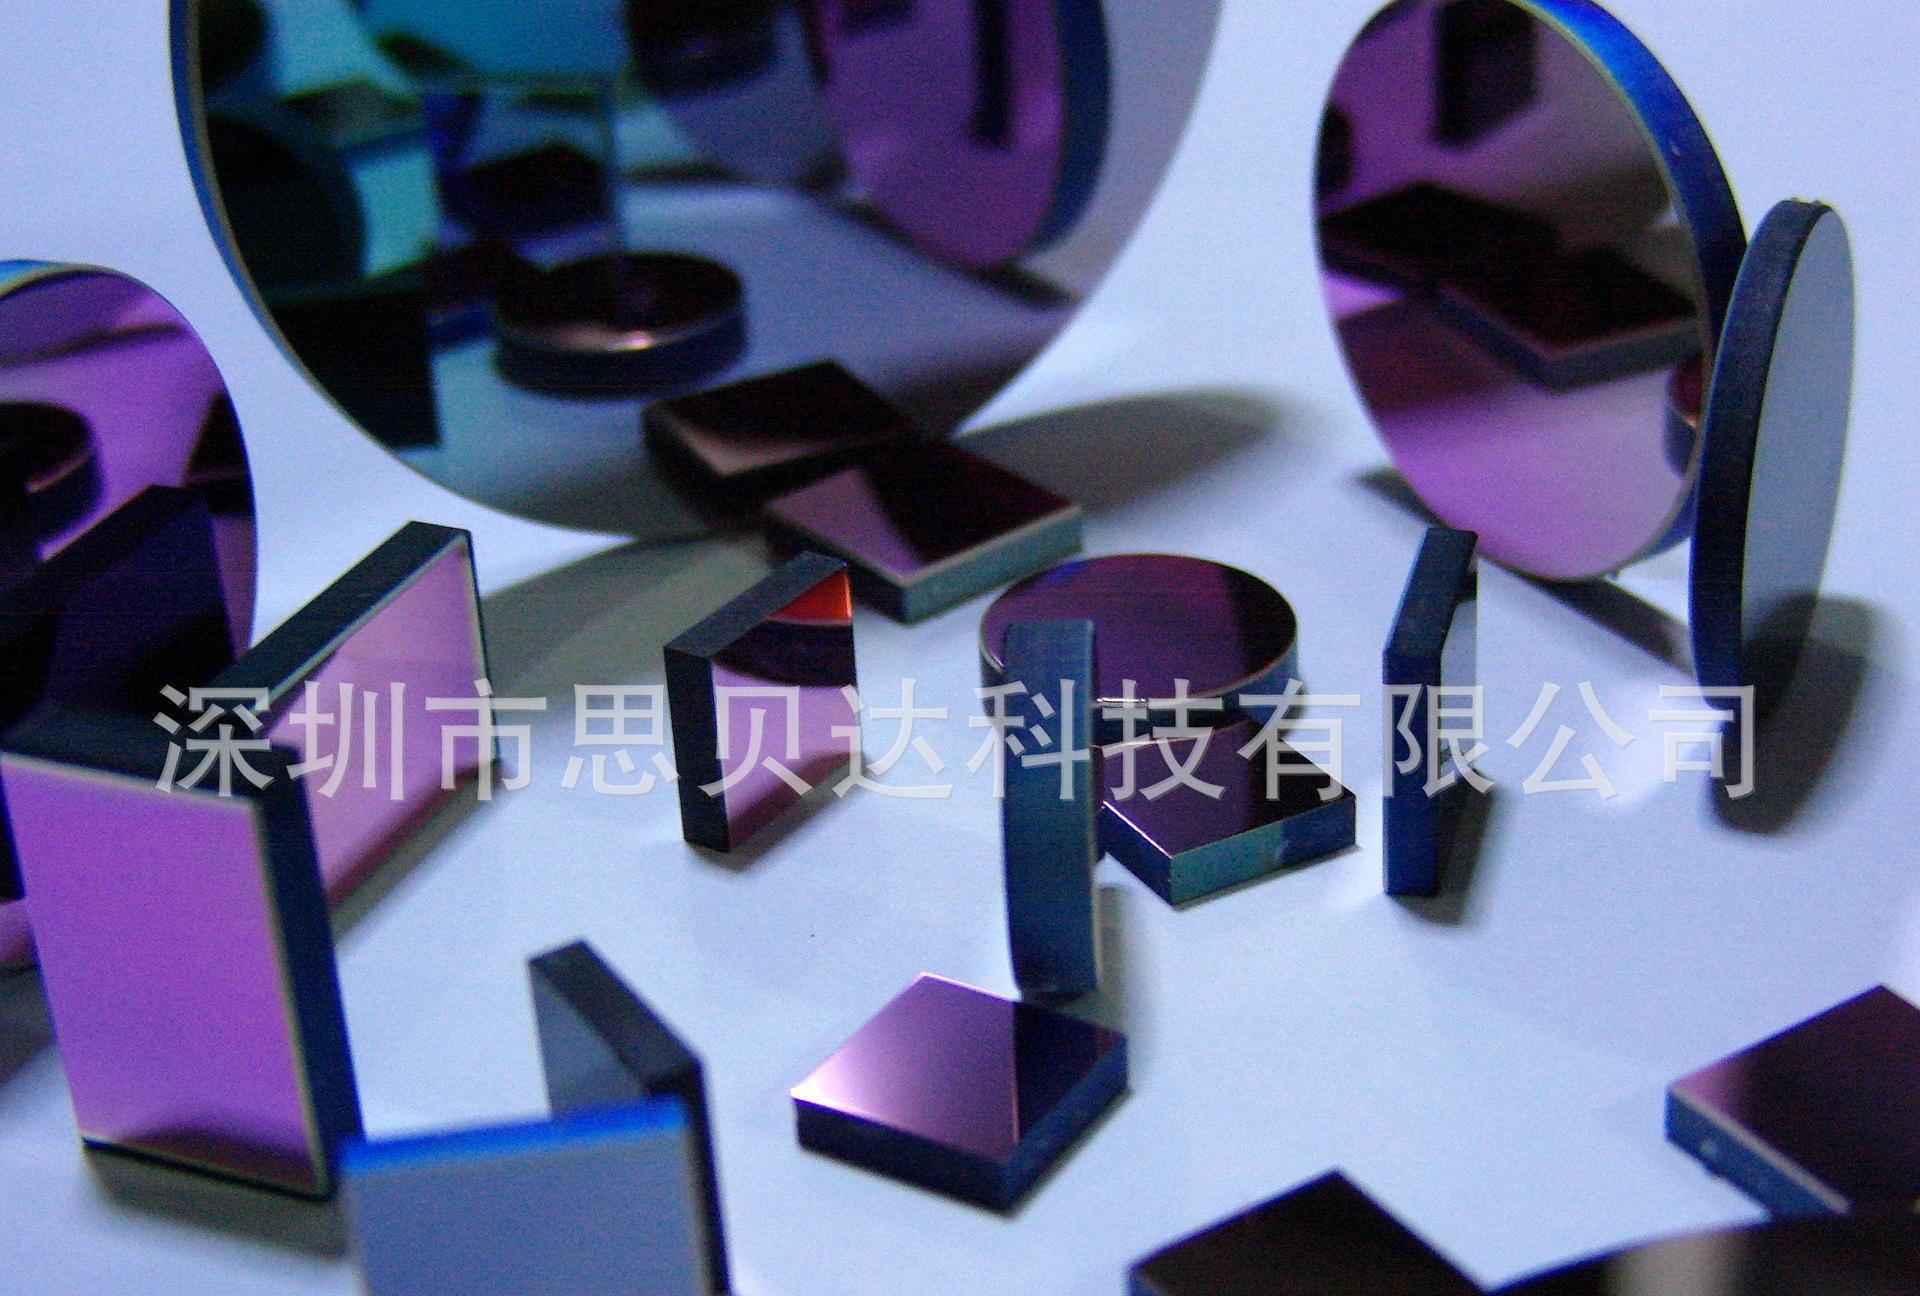 3D四輪定位儀系統 四輪定位儀940nm窄帶濾光片思貝達廠家專供圖片